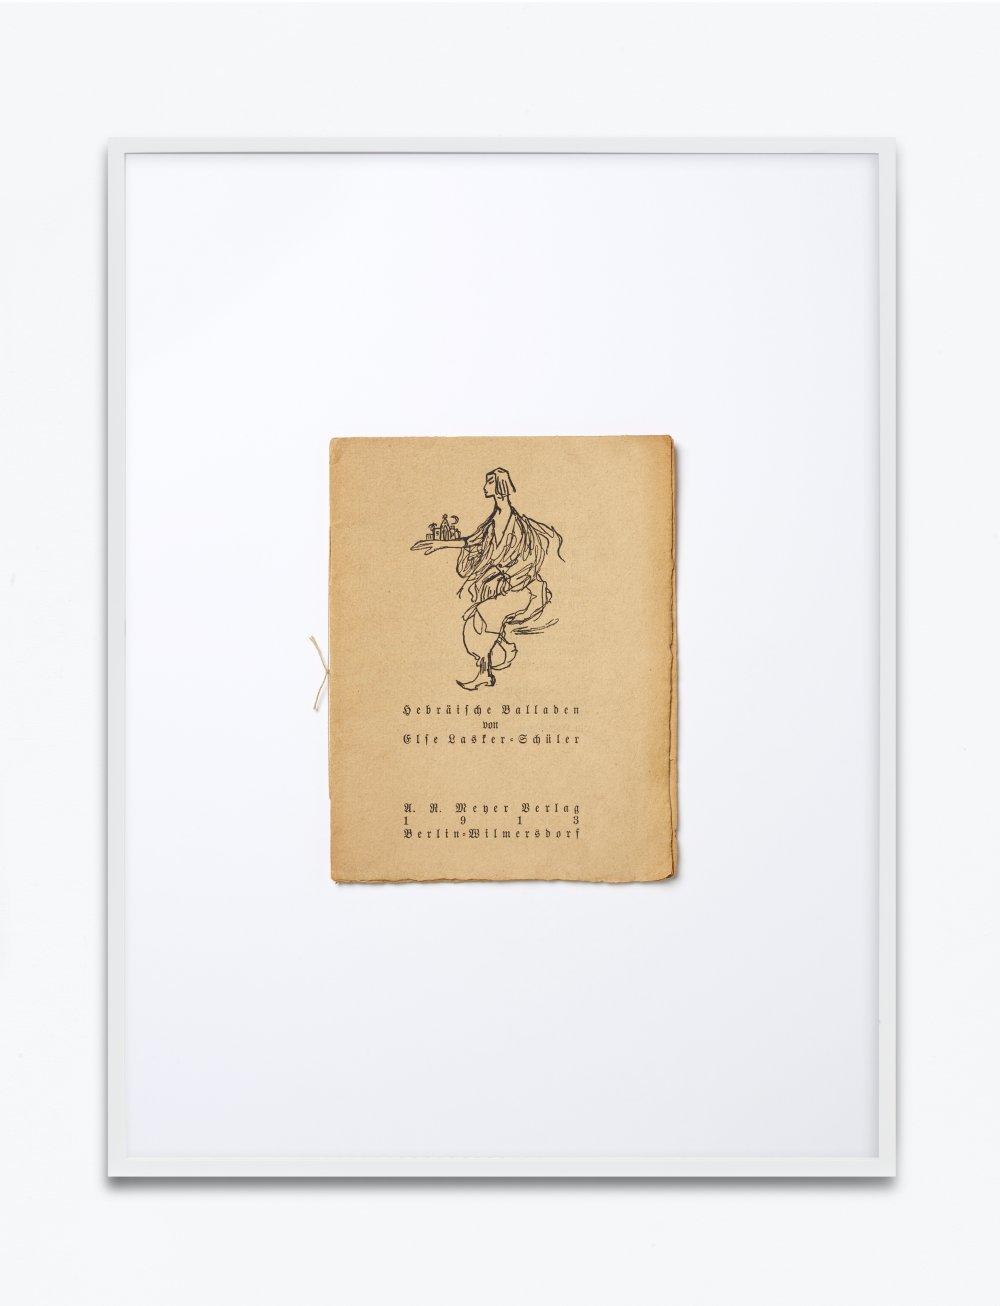 "Else Lasker-Schüler, Hebräische Balladen, 1913, U.R. Mener Verlag, Berlin Wilmersdorf, Einbandgestaltung Else Lasker-Schüler, ""Jussufs Versunkenheit"""